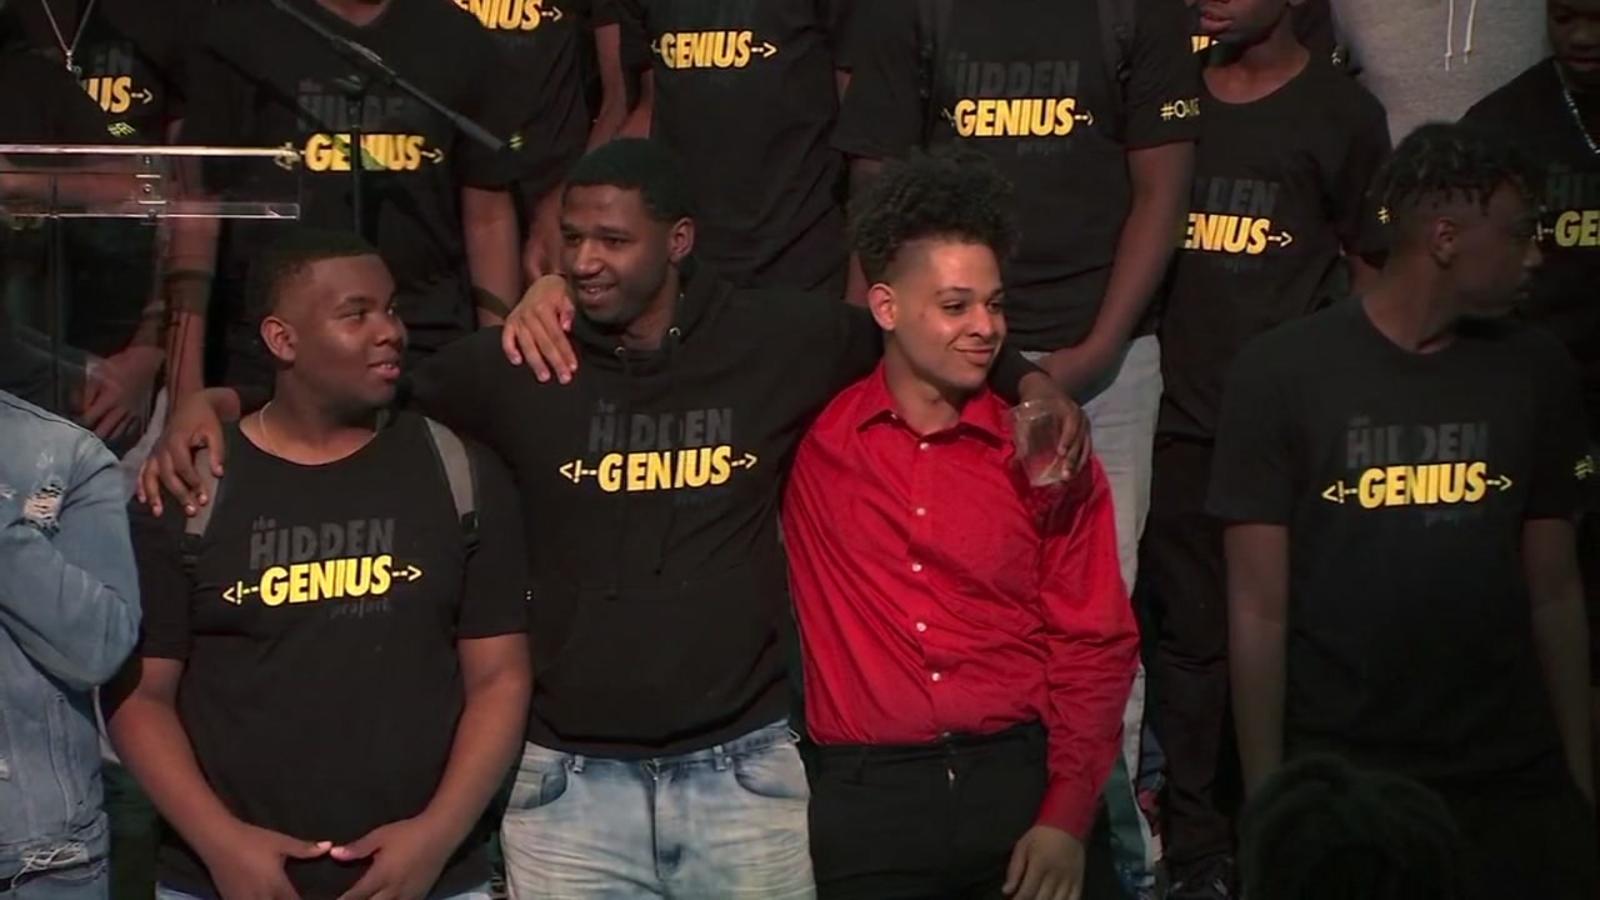 Program promises to unleash 'hidden genius' in Oakland's young, black male population